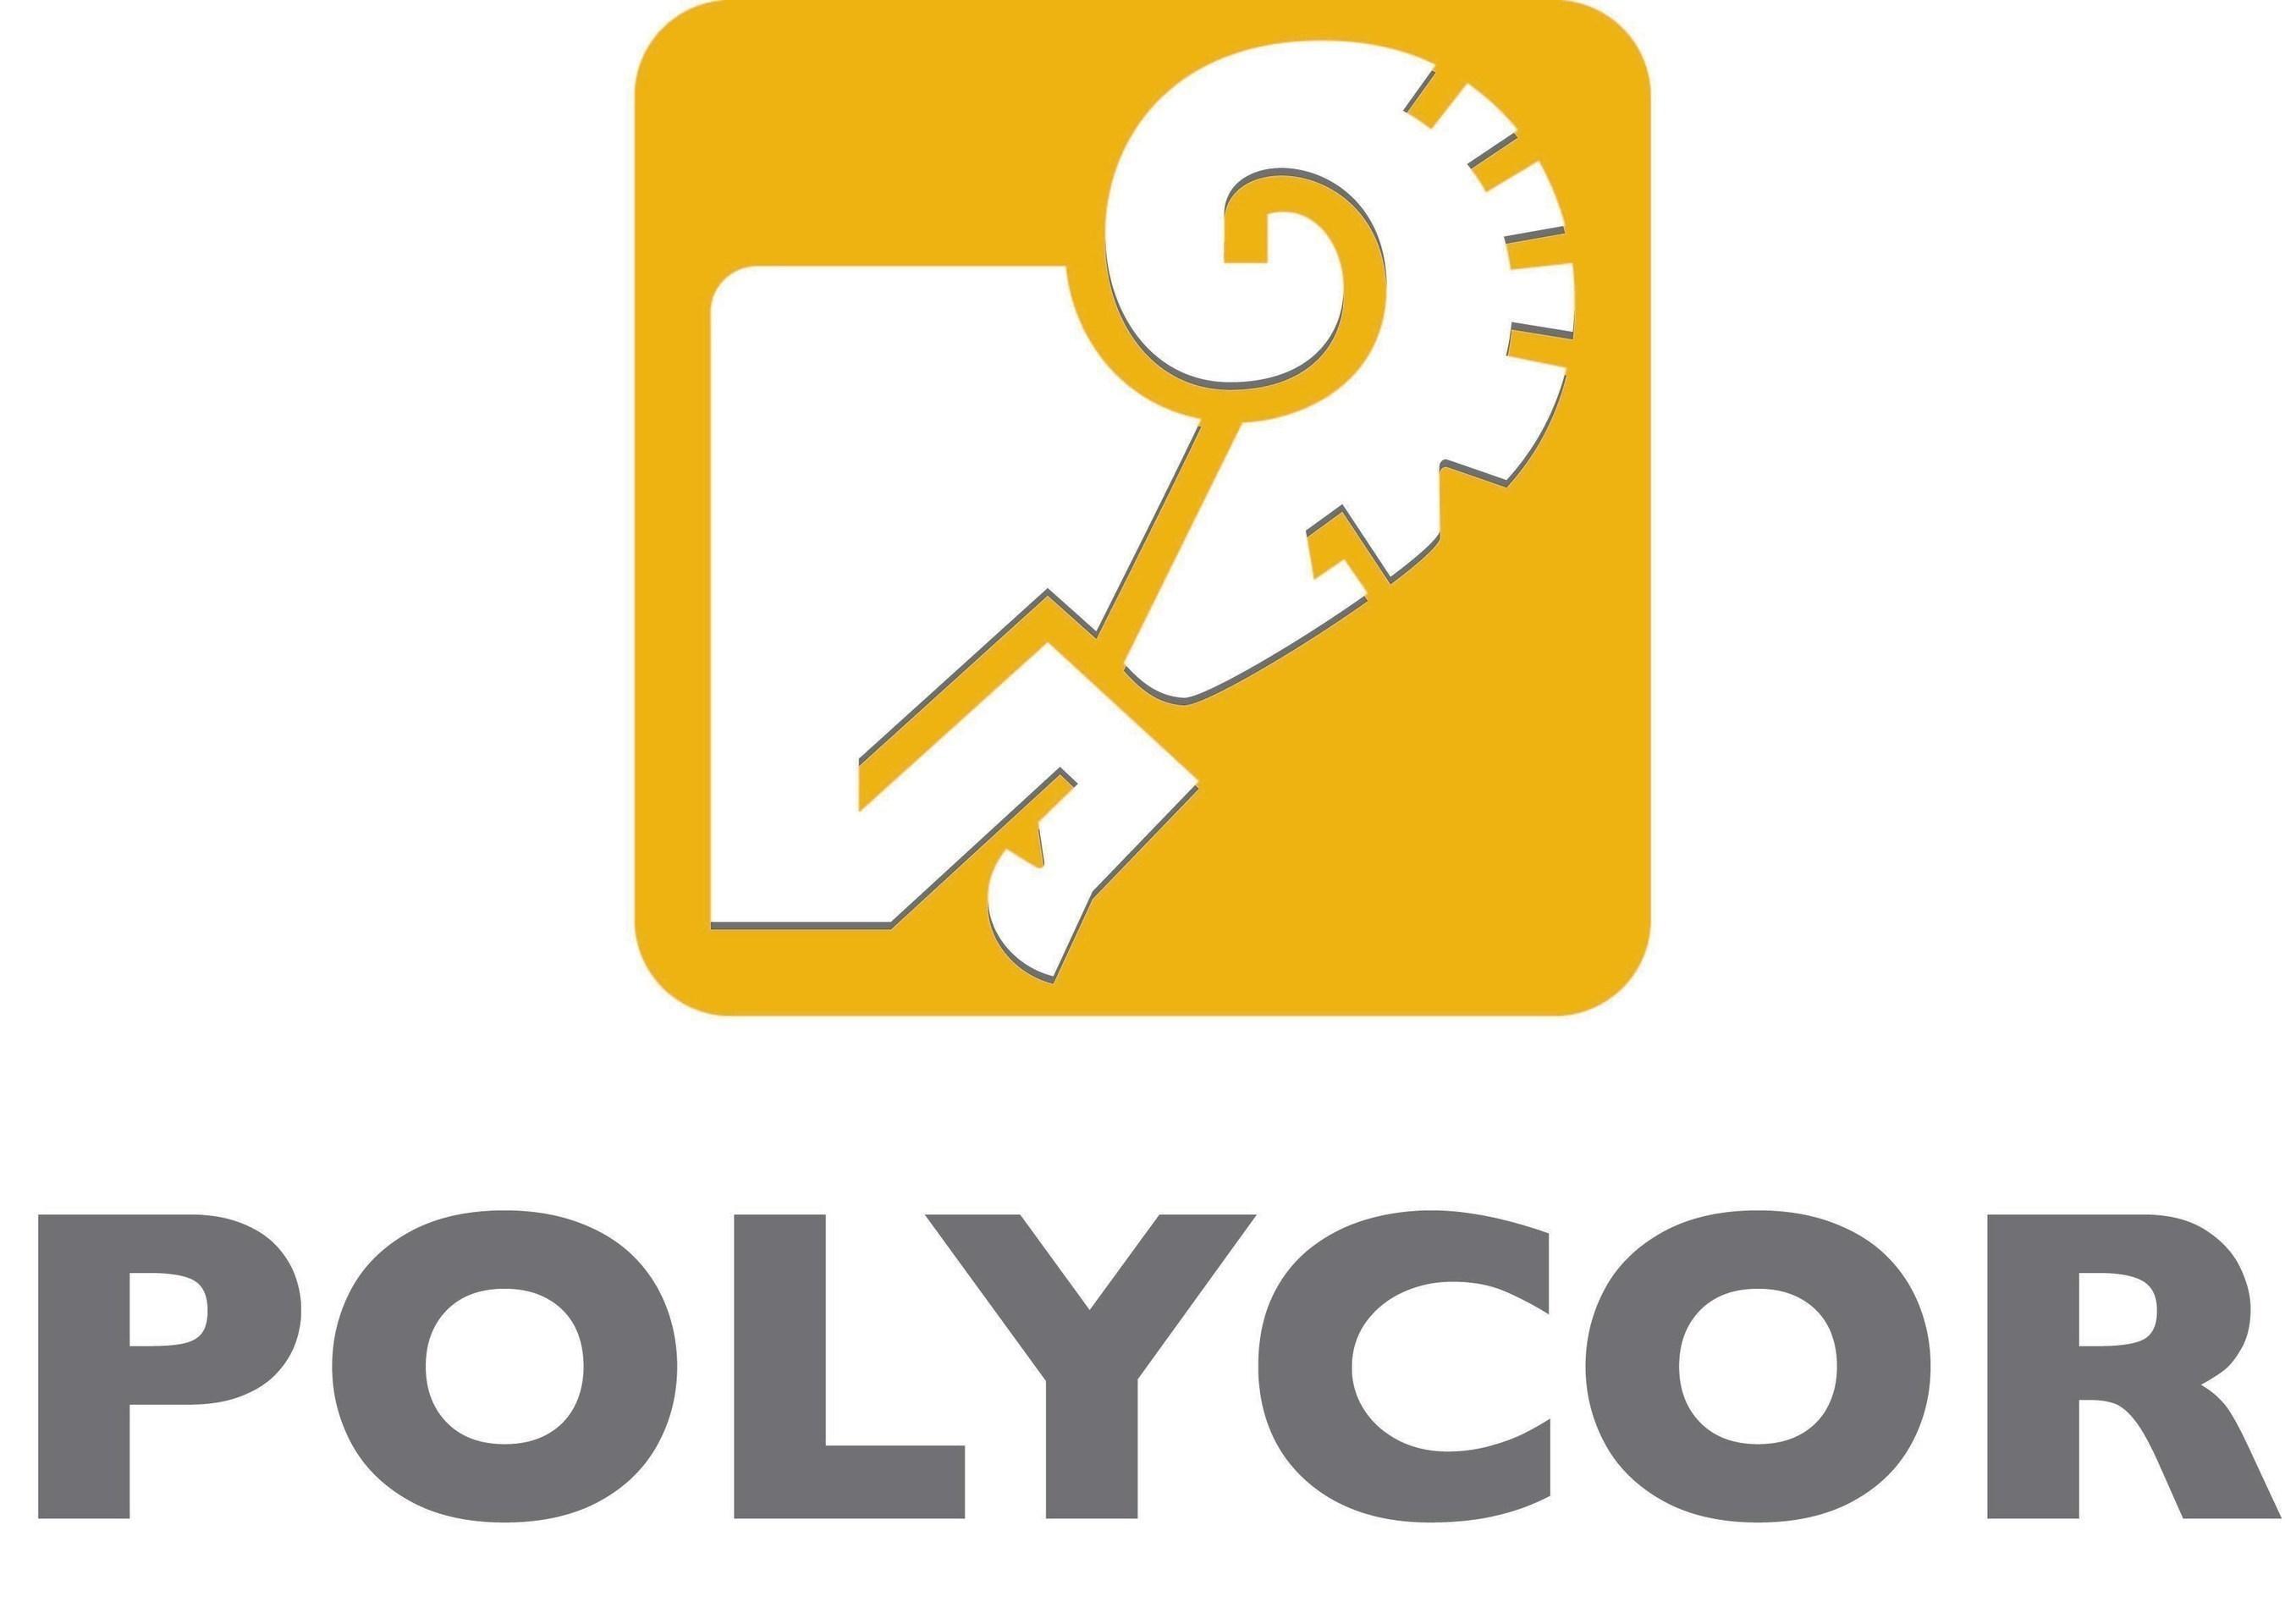 Polycor, Inc. logo